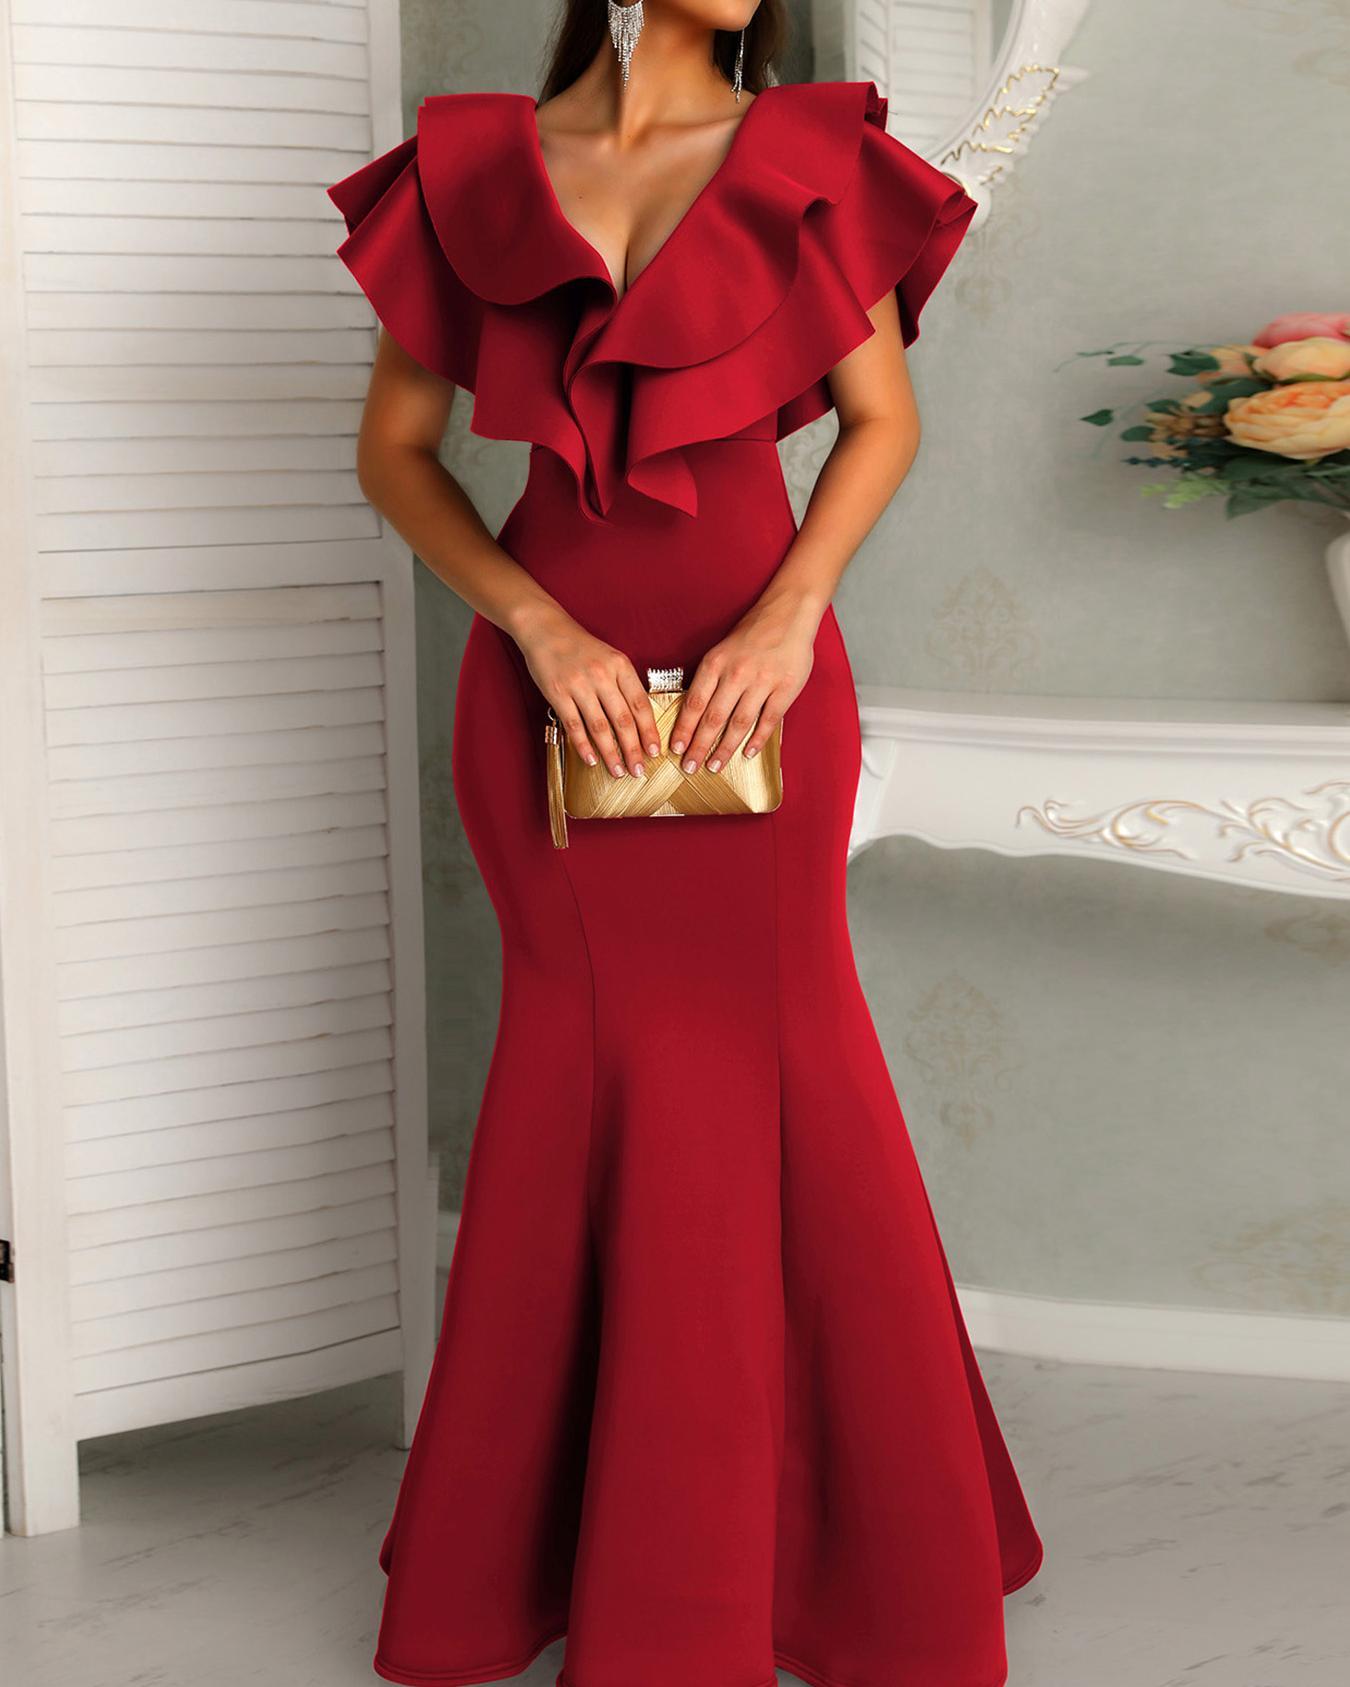 boutiquefeel / Deep V Layered Ruffles Fishtail Evening Dress